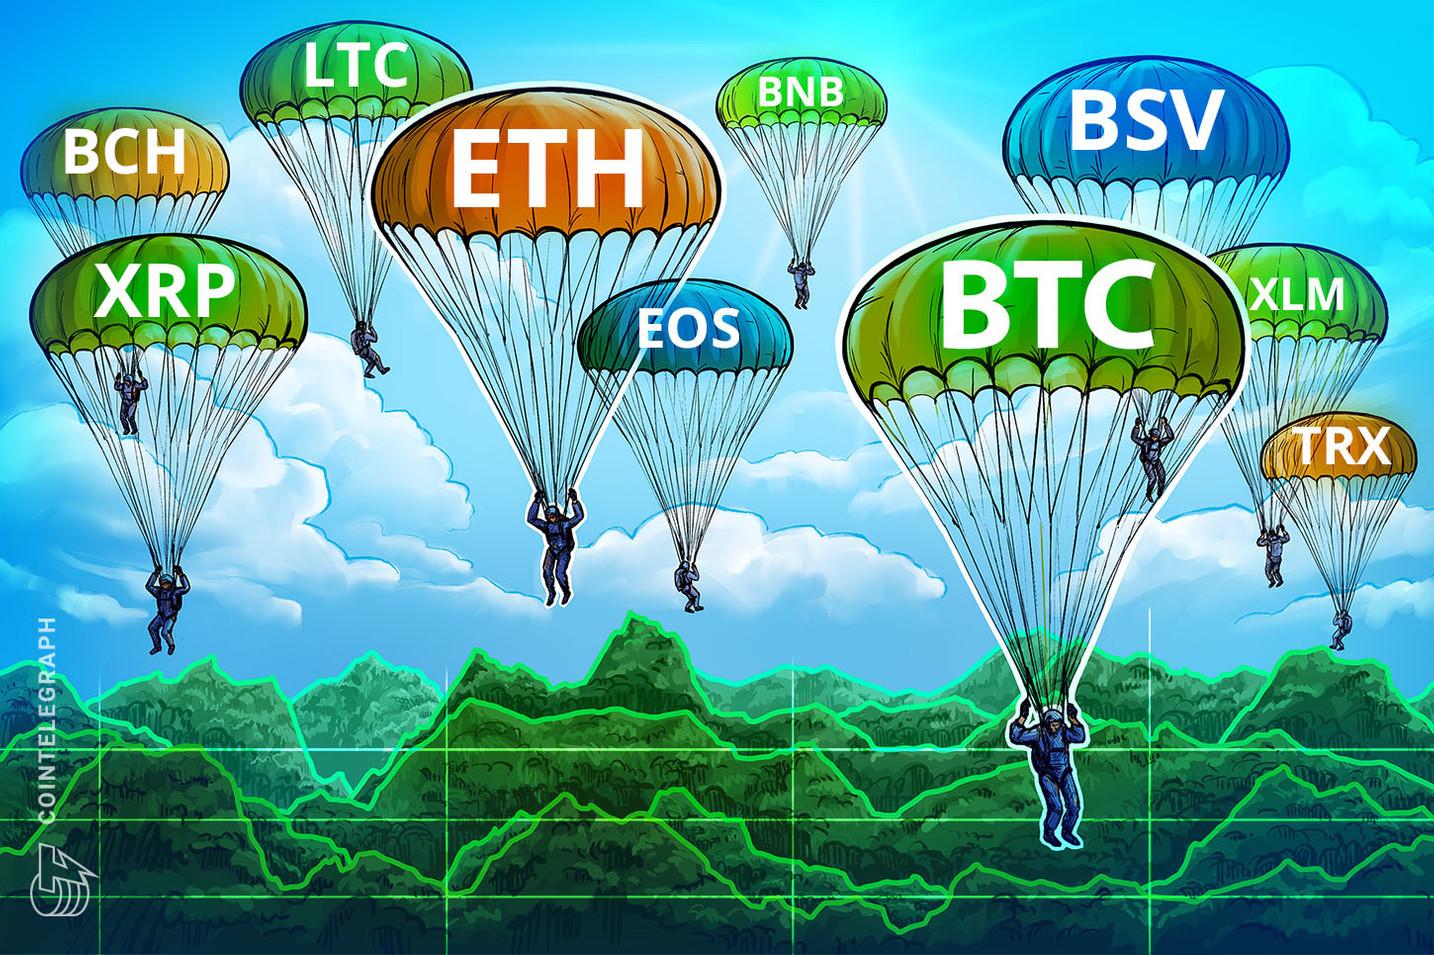 Price Analysis 27/11: BTC, ETH, XRP, BCH, LTC, EOS, BNB, BSV, XLM, TRX